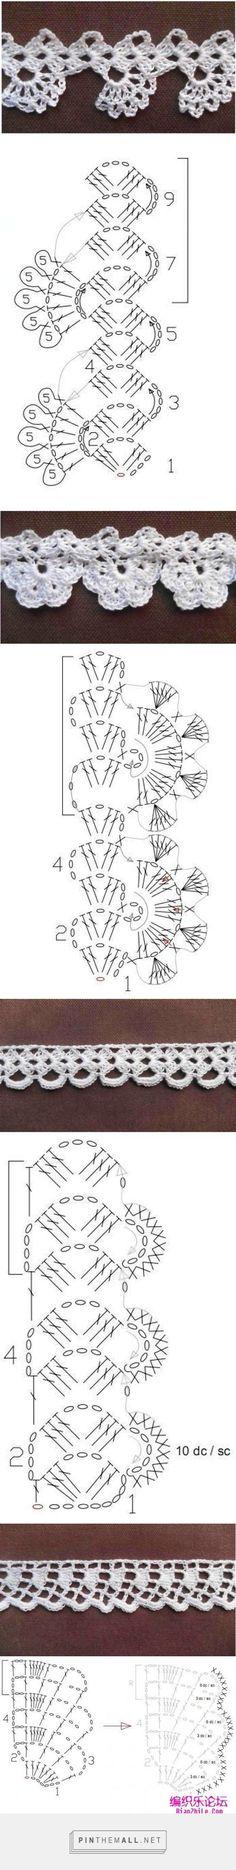 crochet lace ...♥ Deniz ♥  